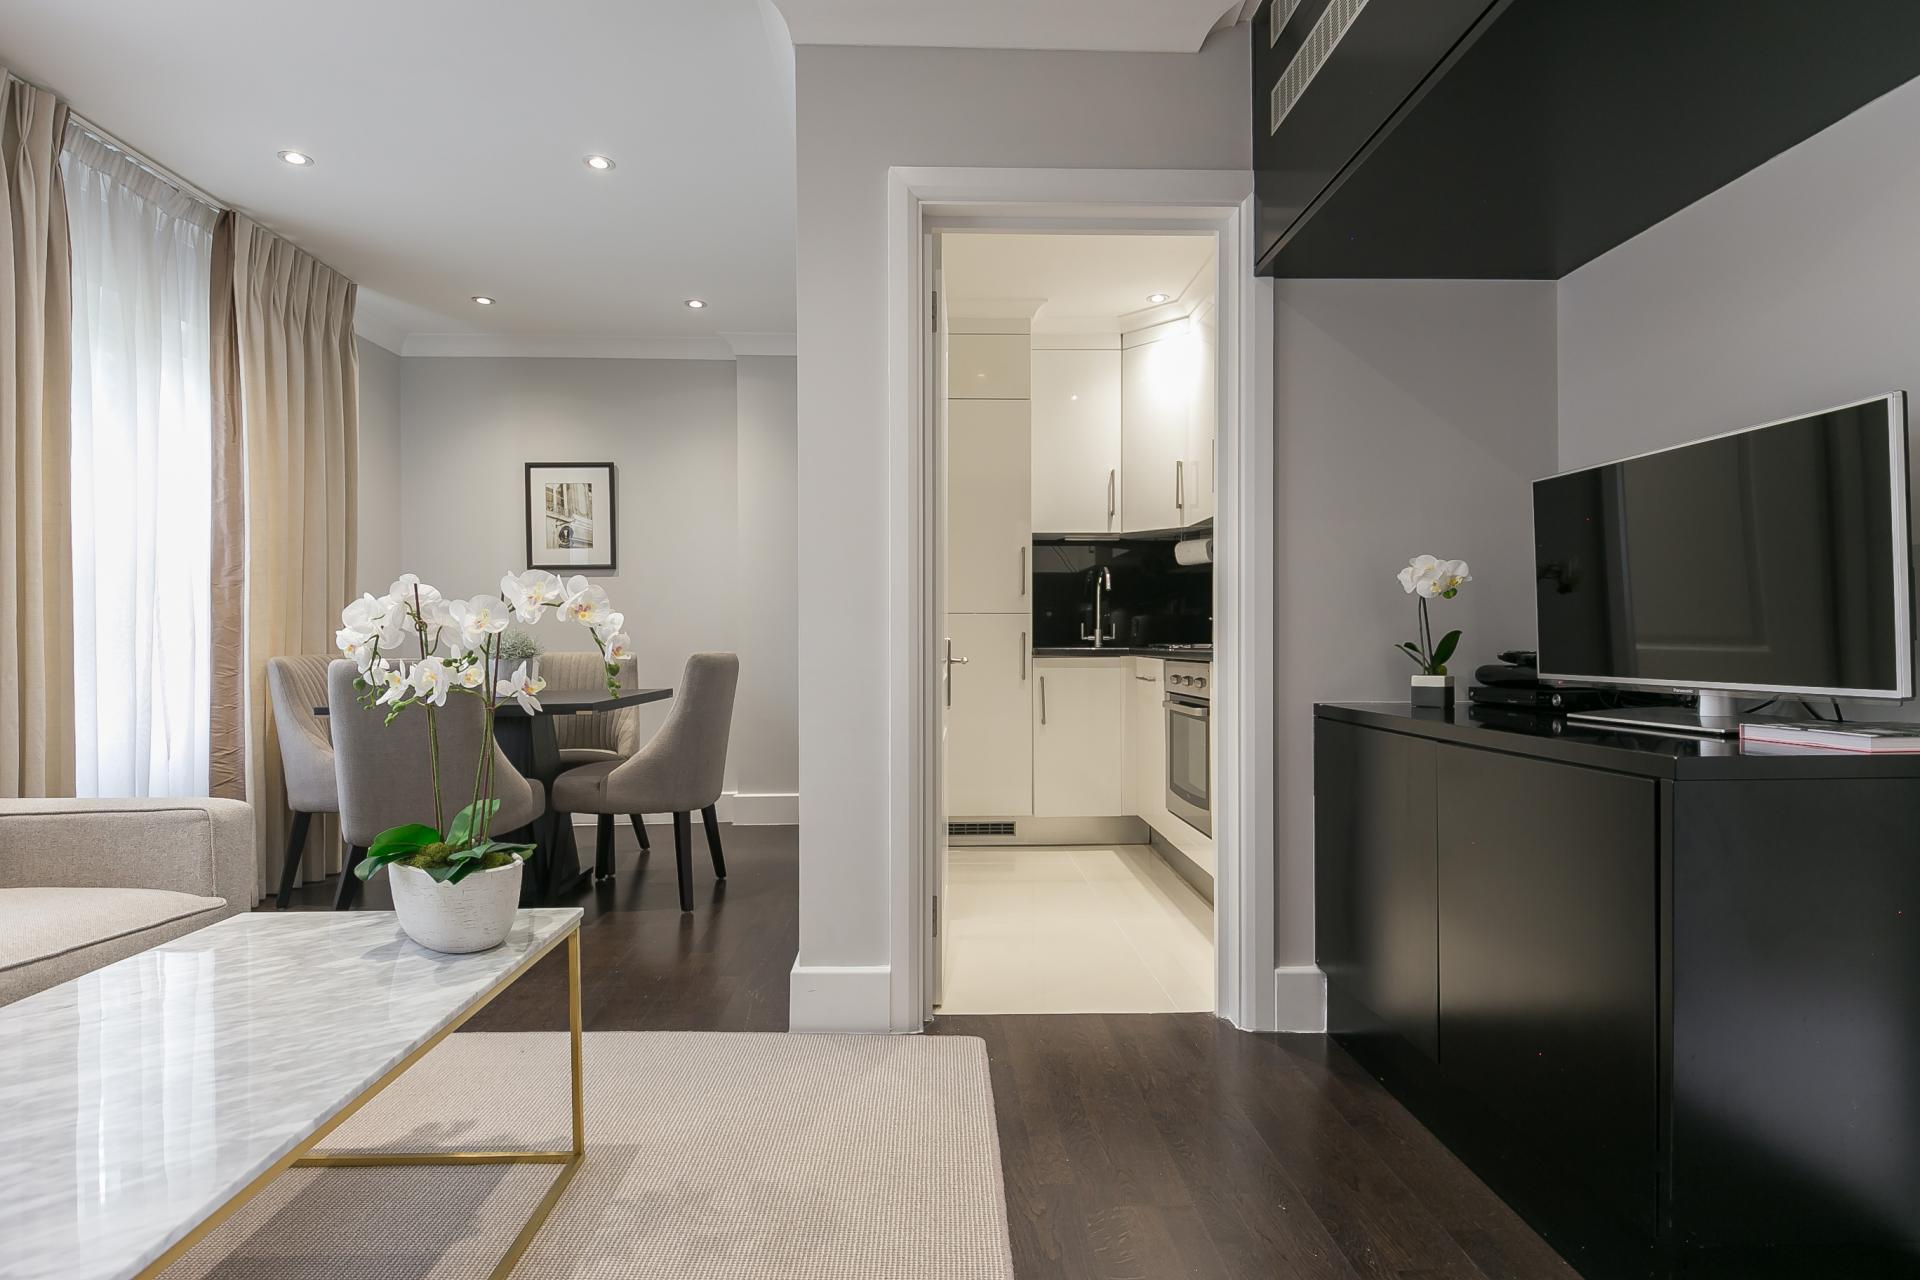 Black cabinets at Chilworth Court Serviced Apartments, Paddington, London